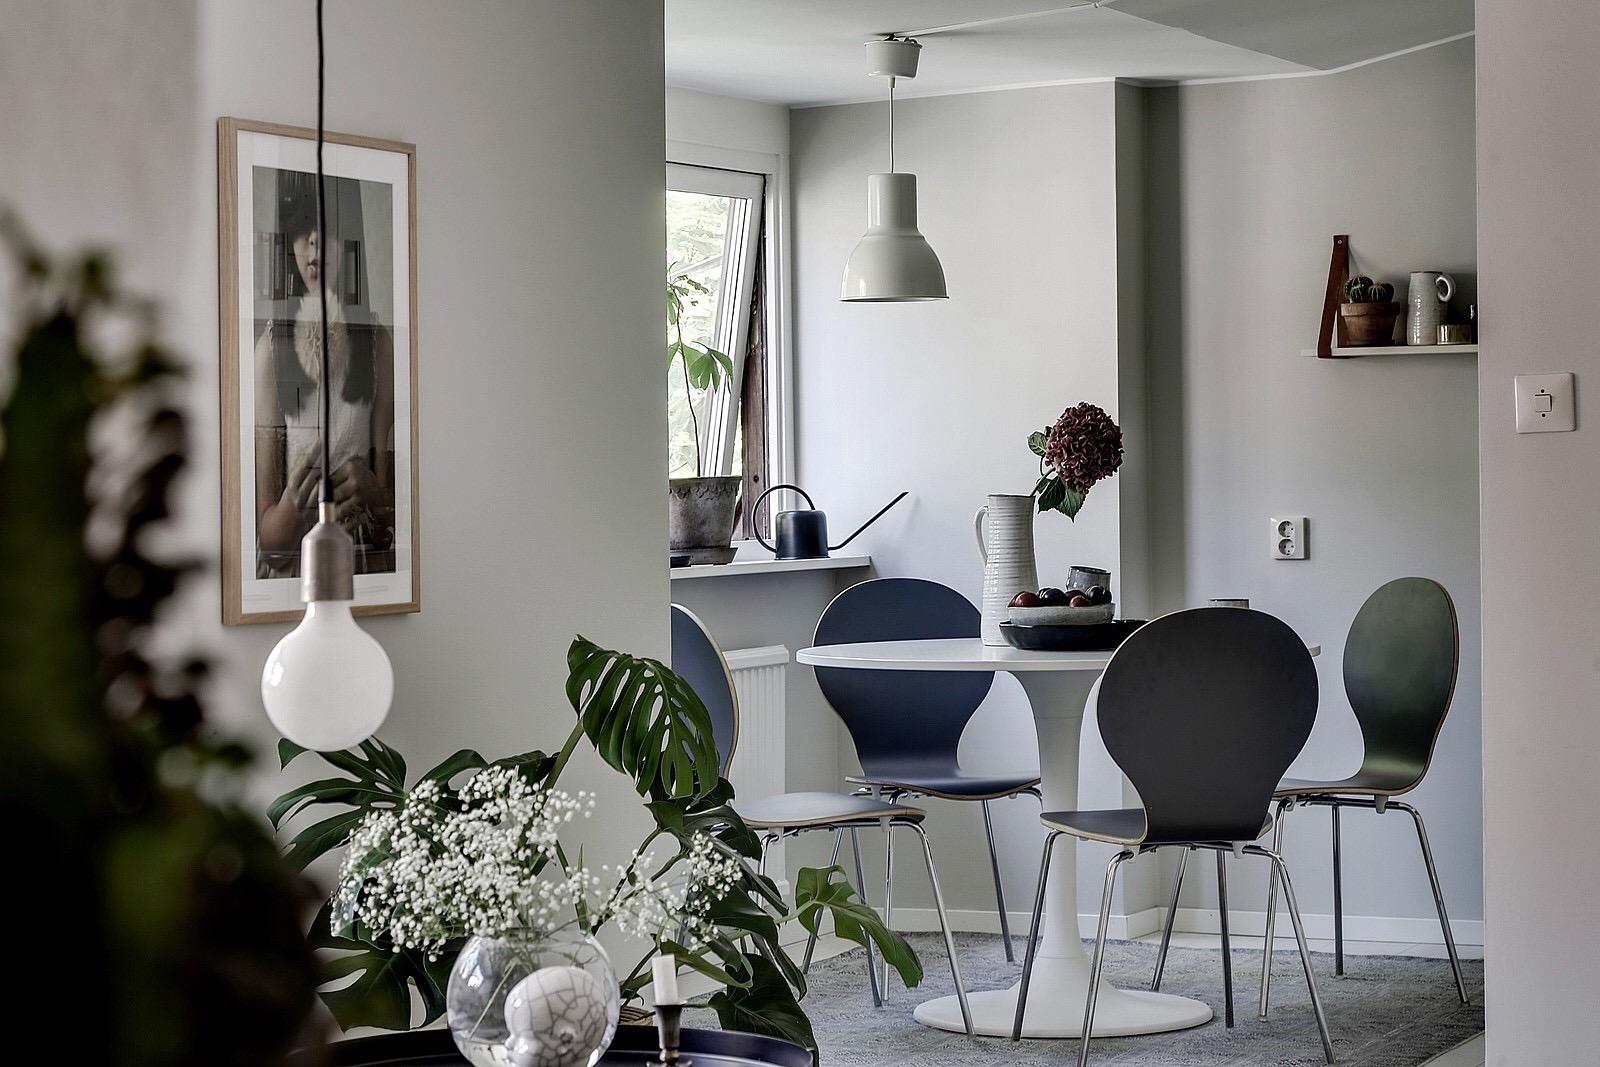 гостиная кухня стол стулья лампа